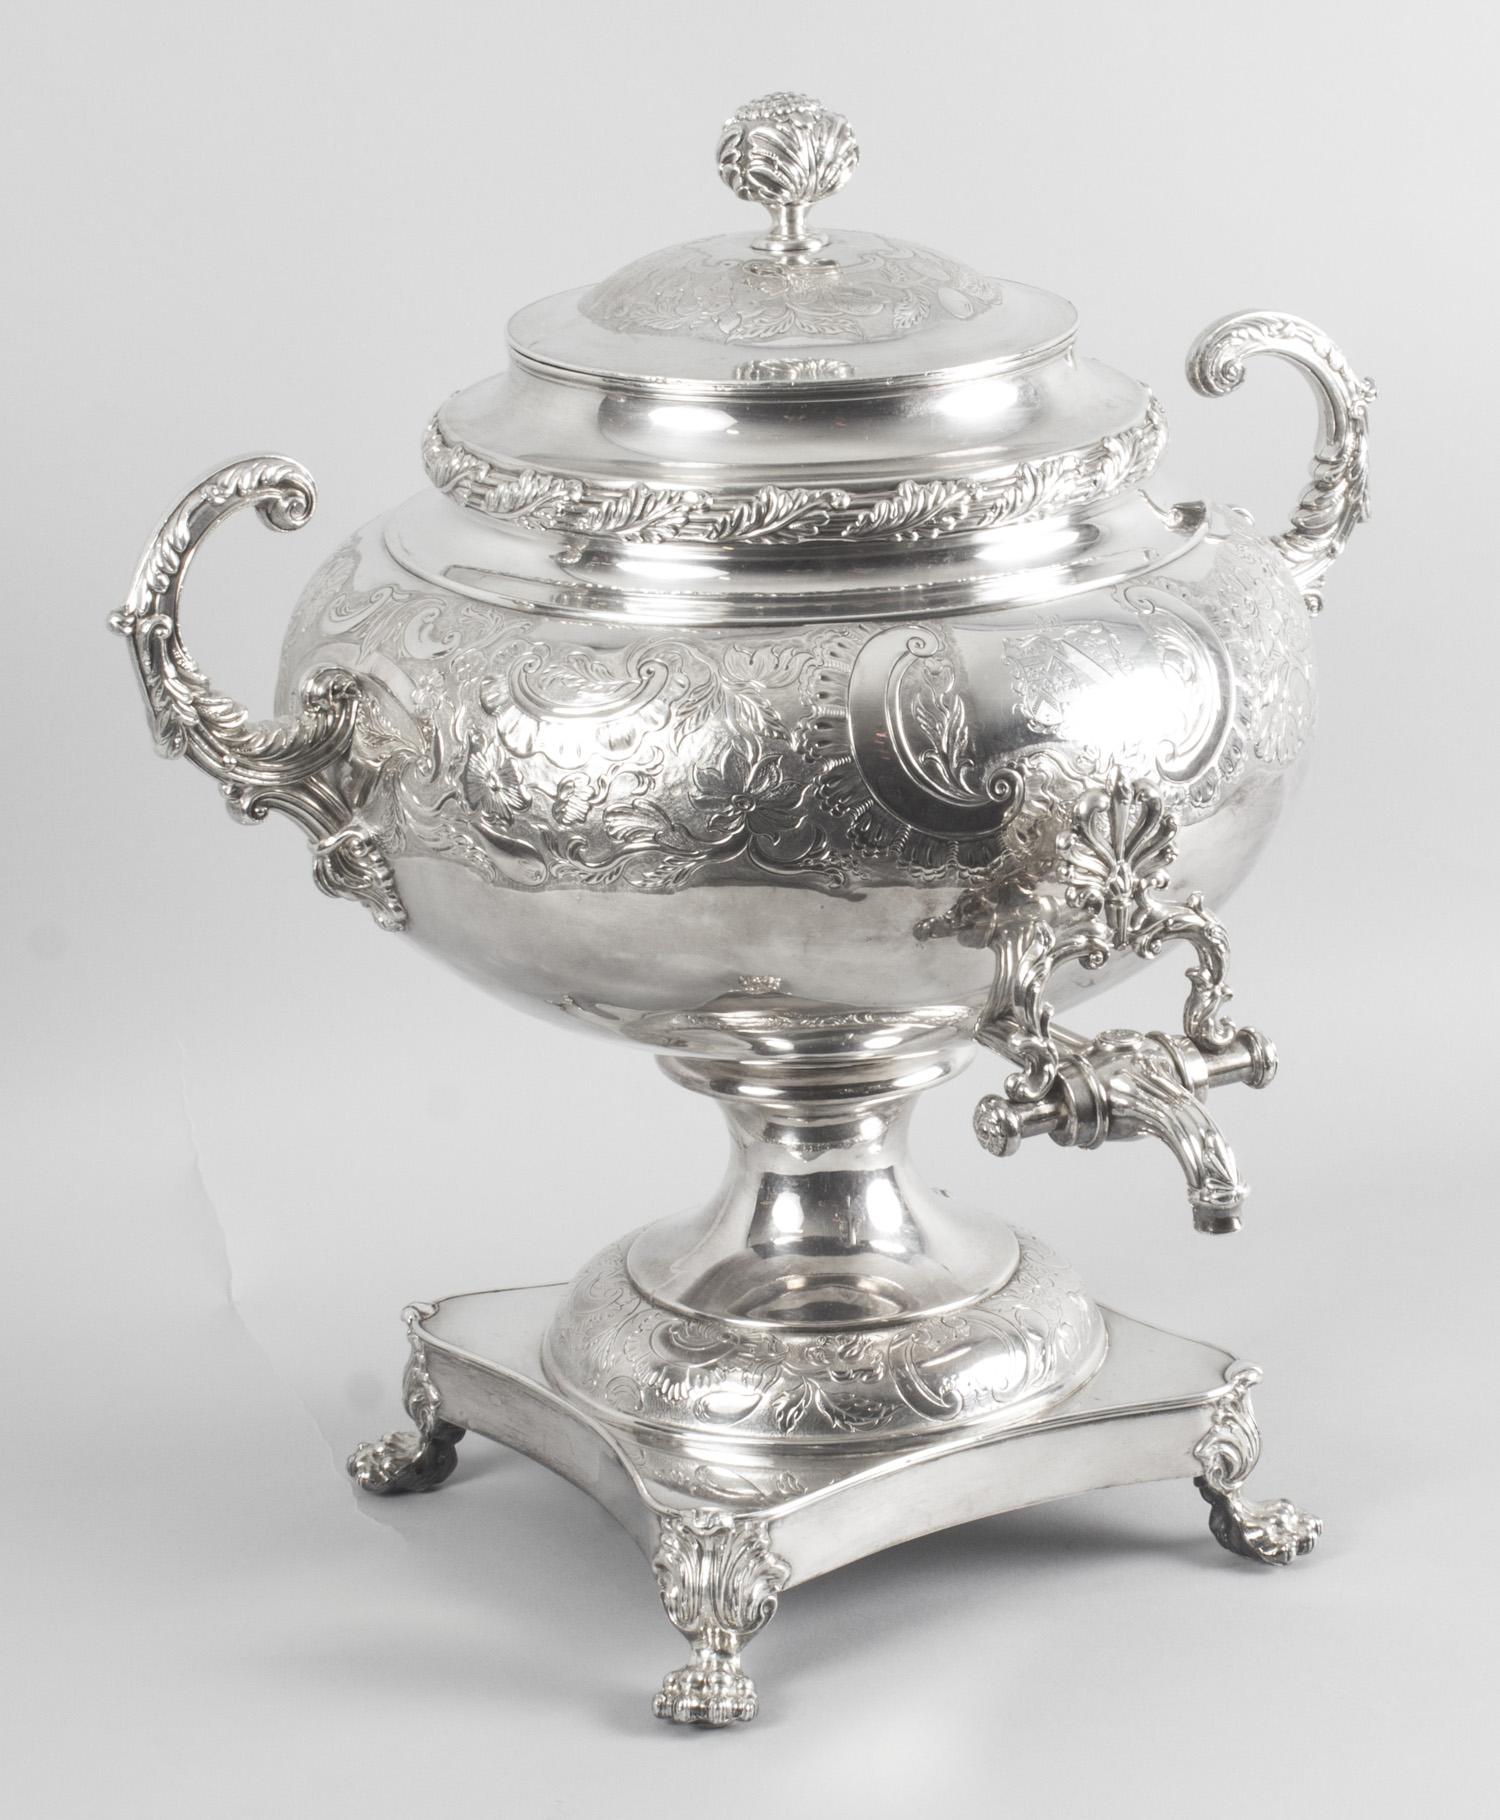 Silver Plated Samovar Ref No 08803 Regent Antiques